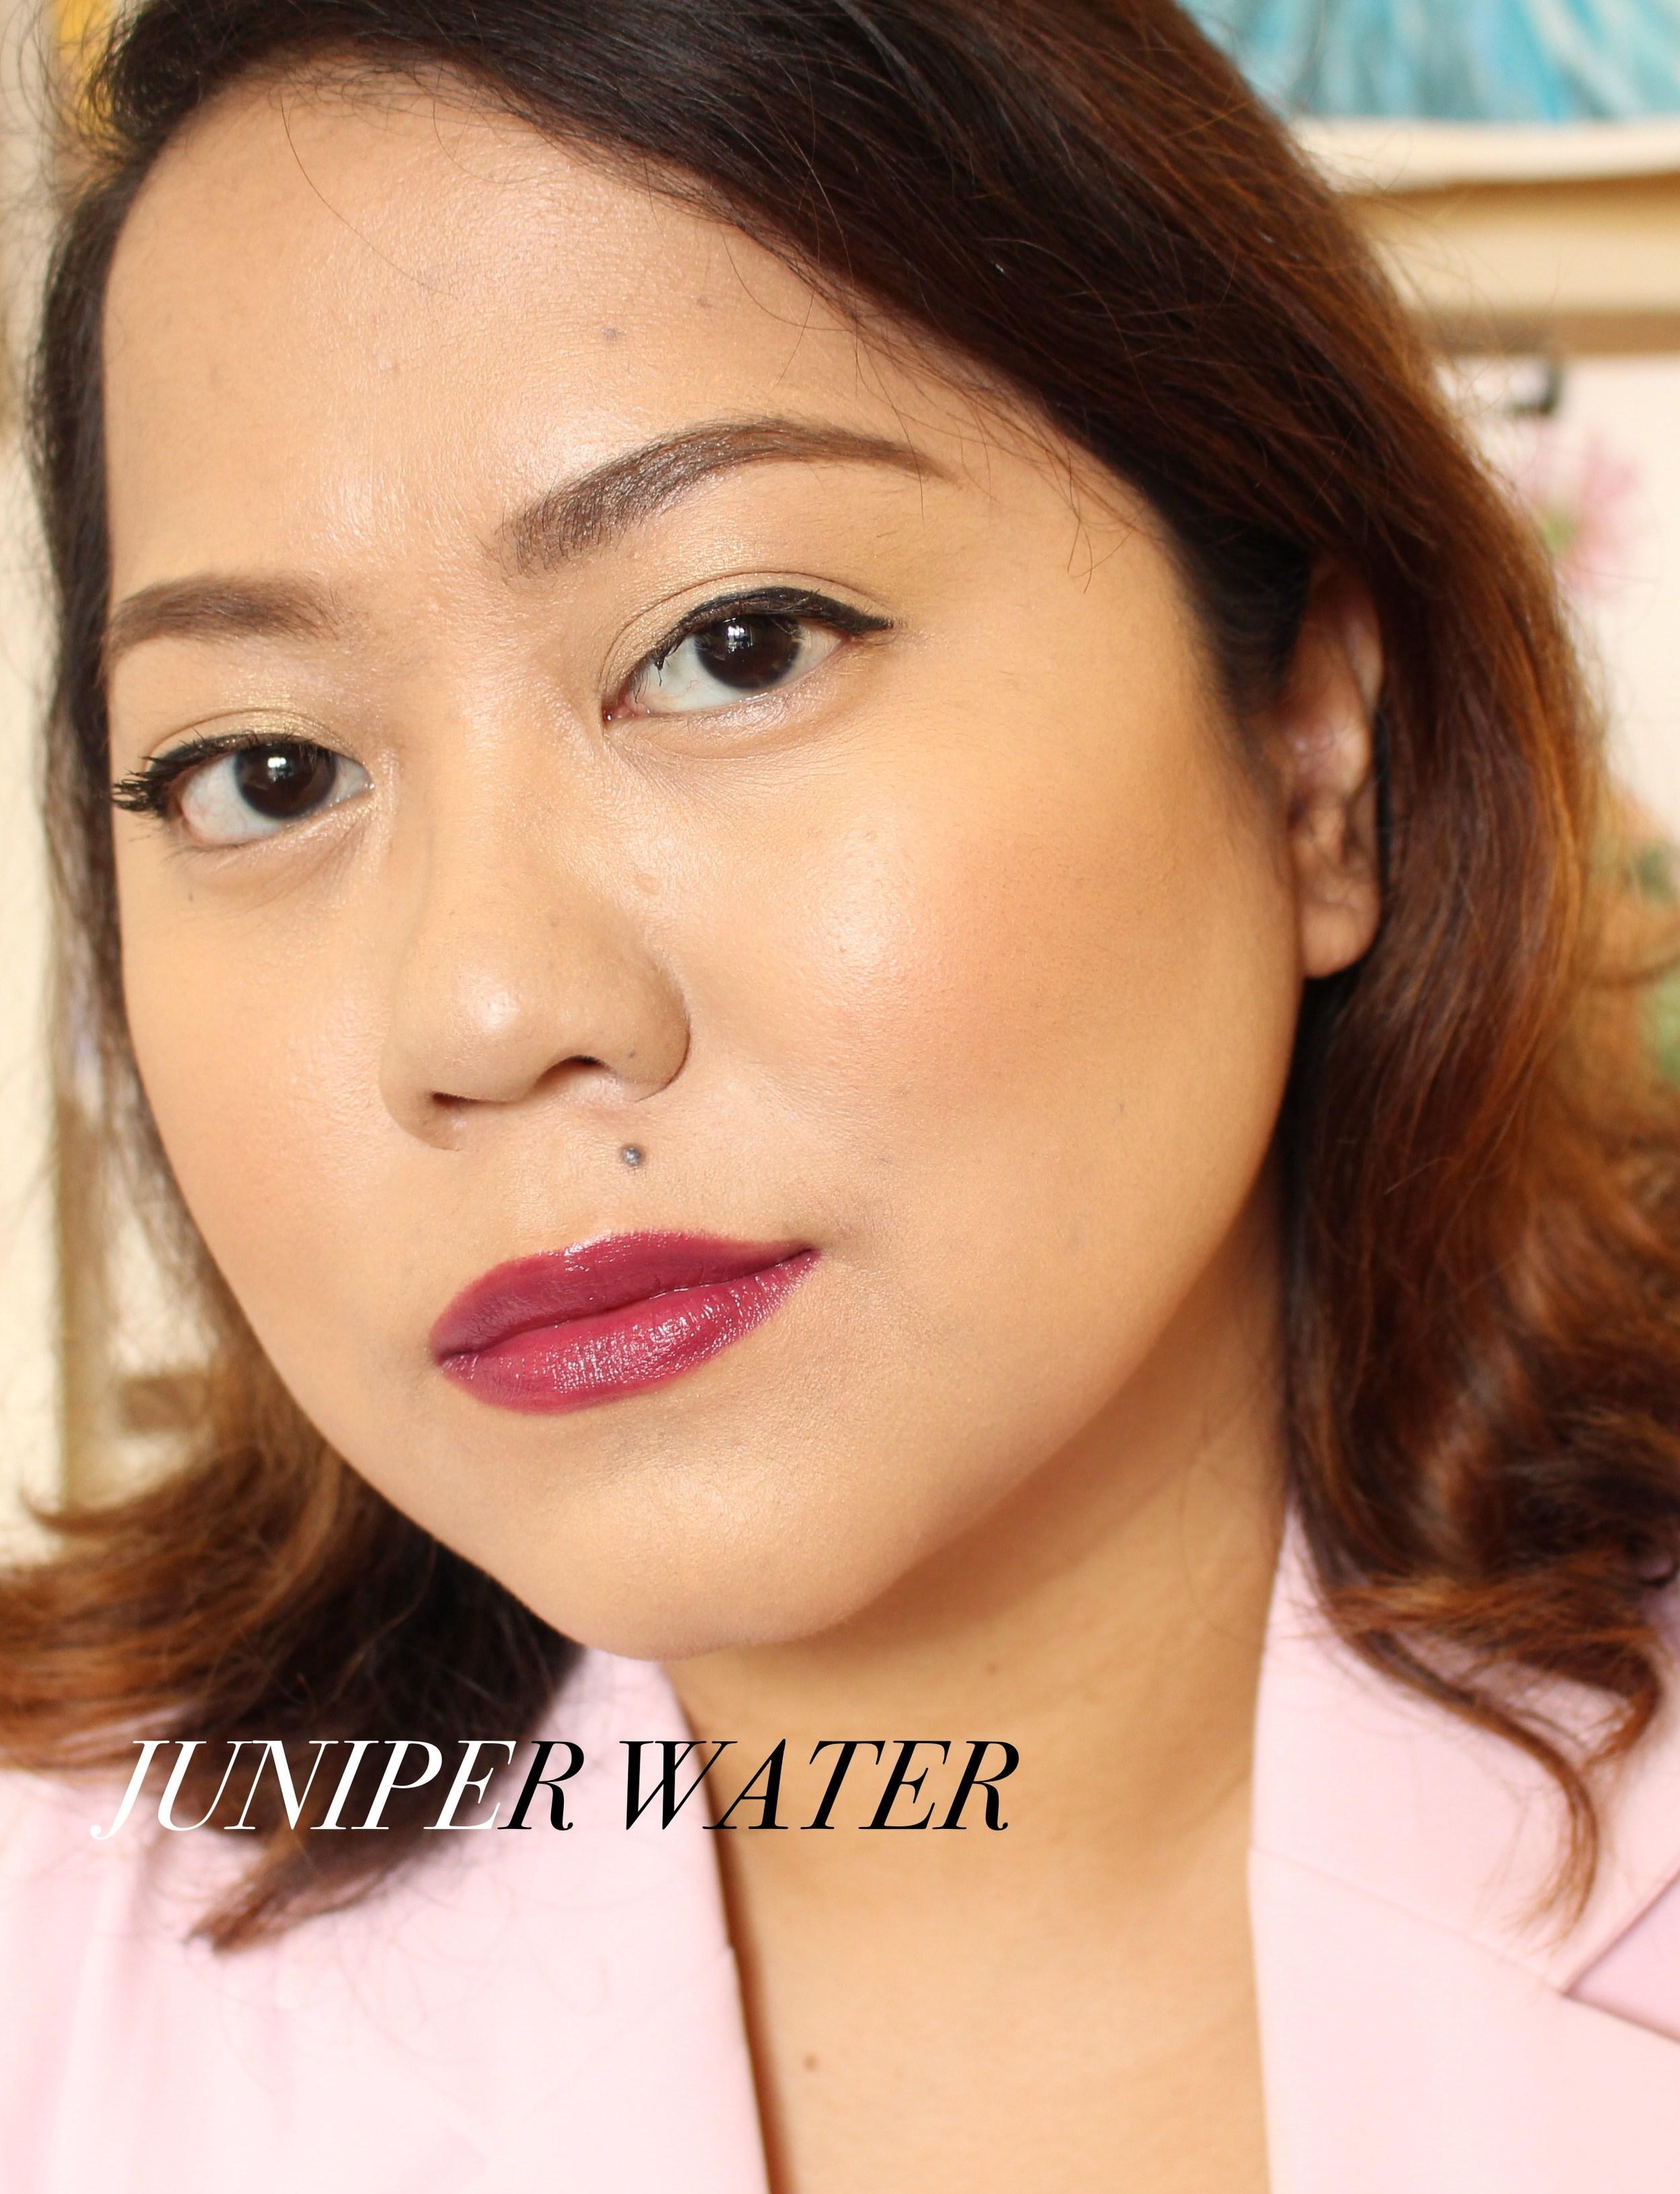 JUNIPER WATER.jpg